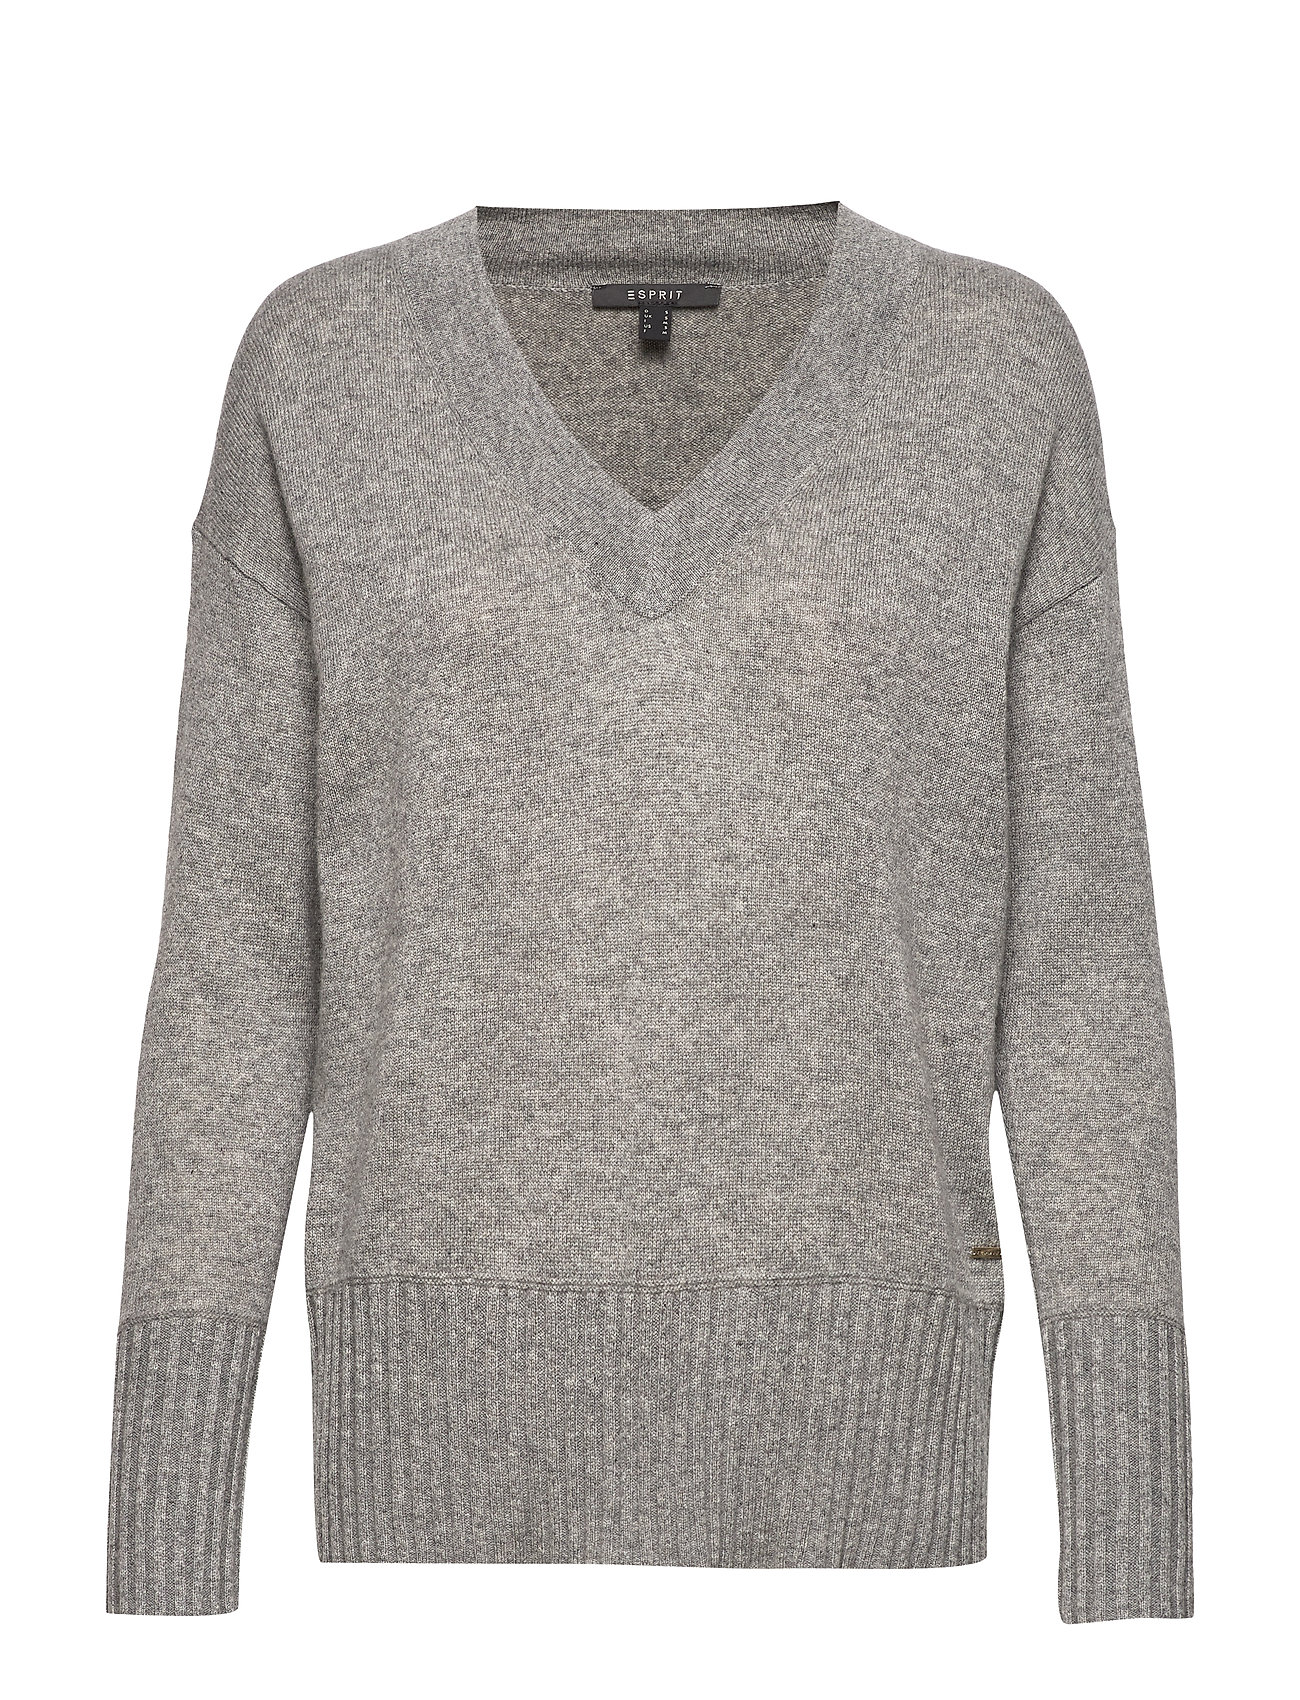 ESPRIT Sweaters Strickpullover Grau ESPRIT COLLECTION